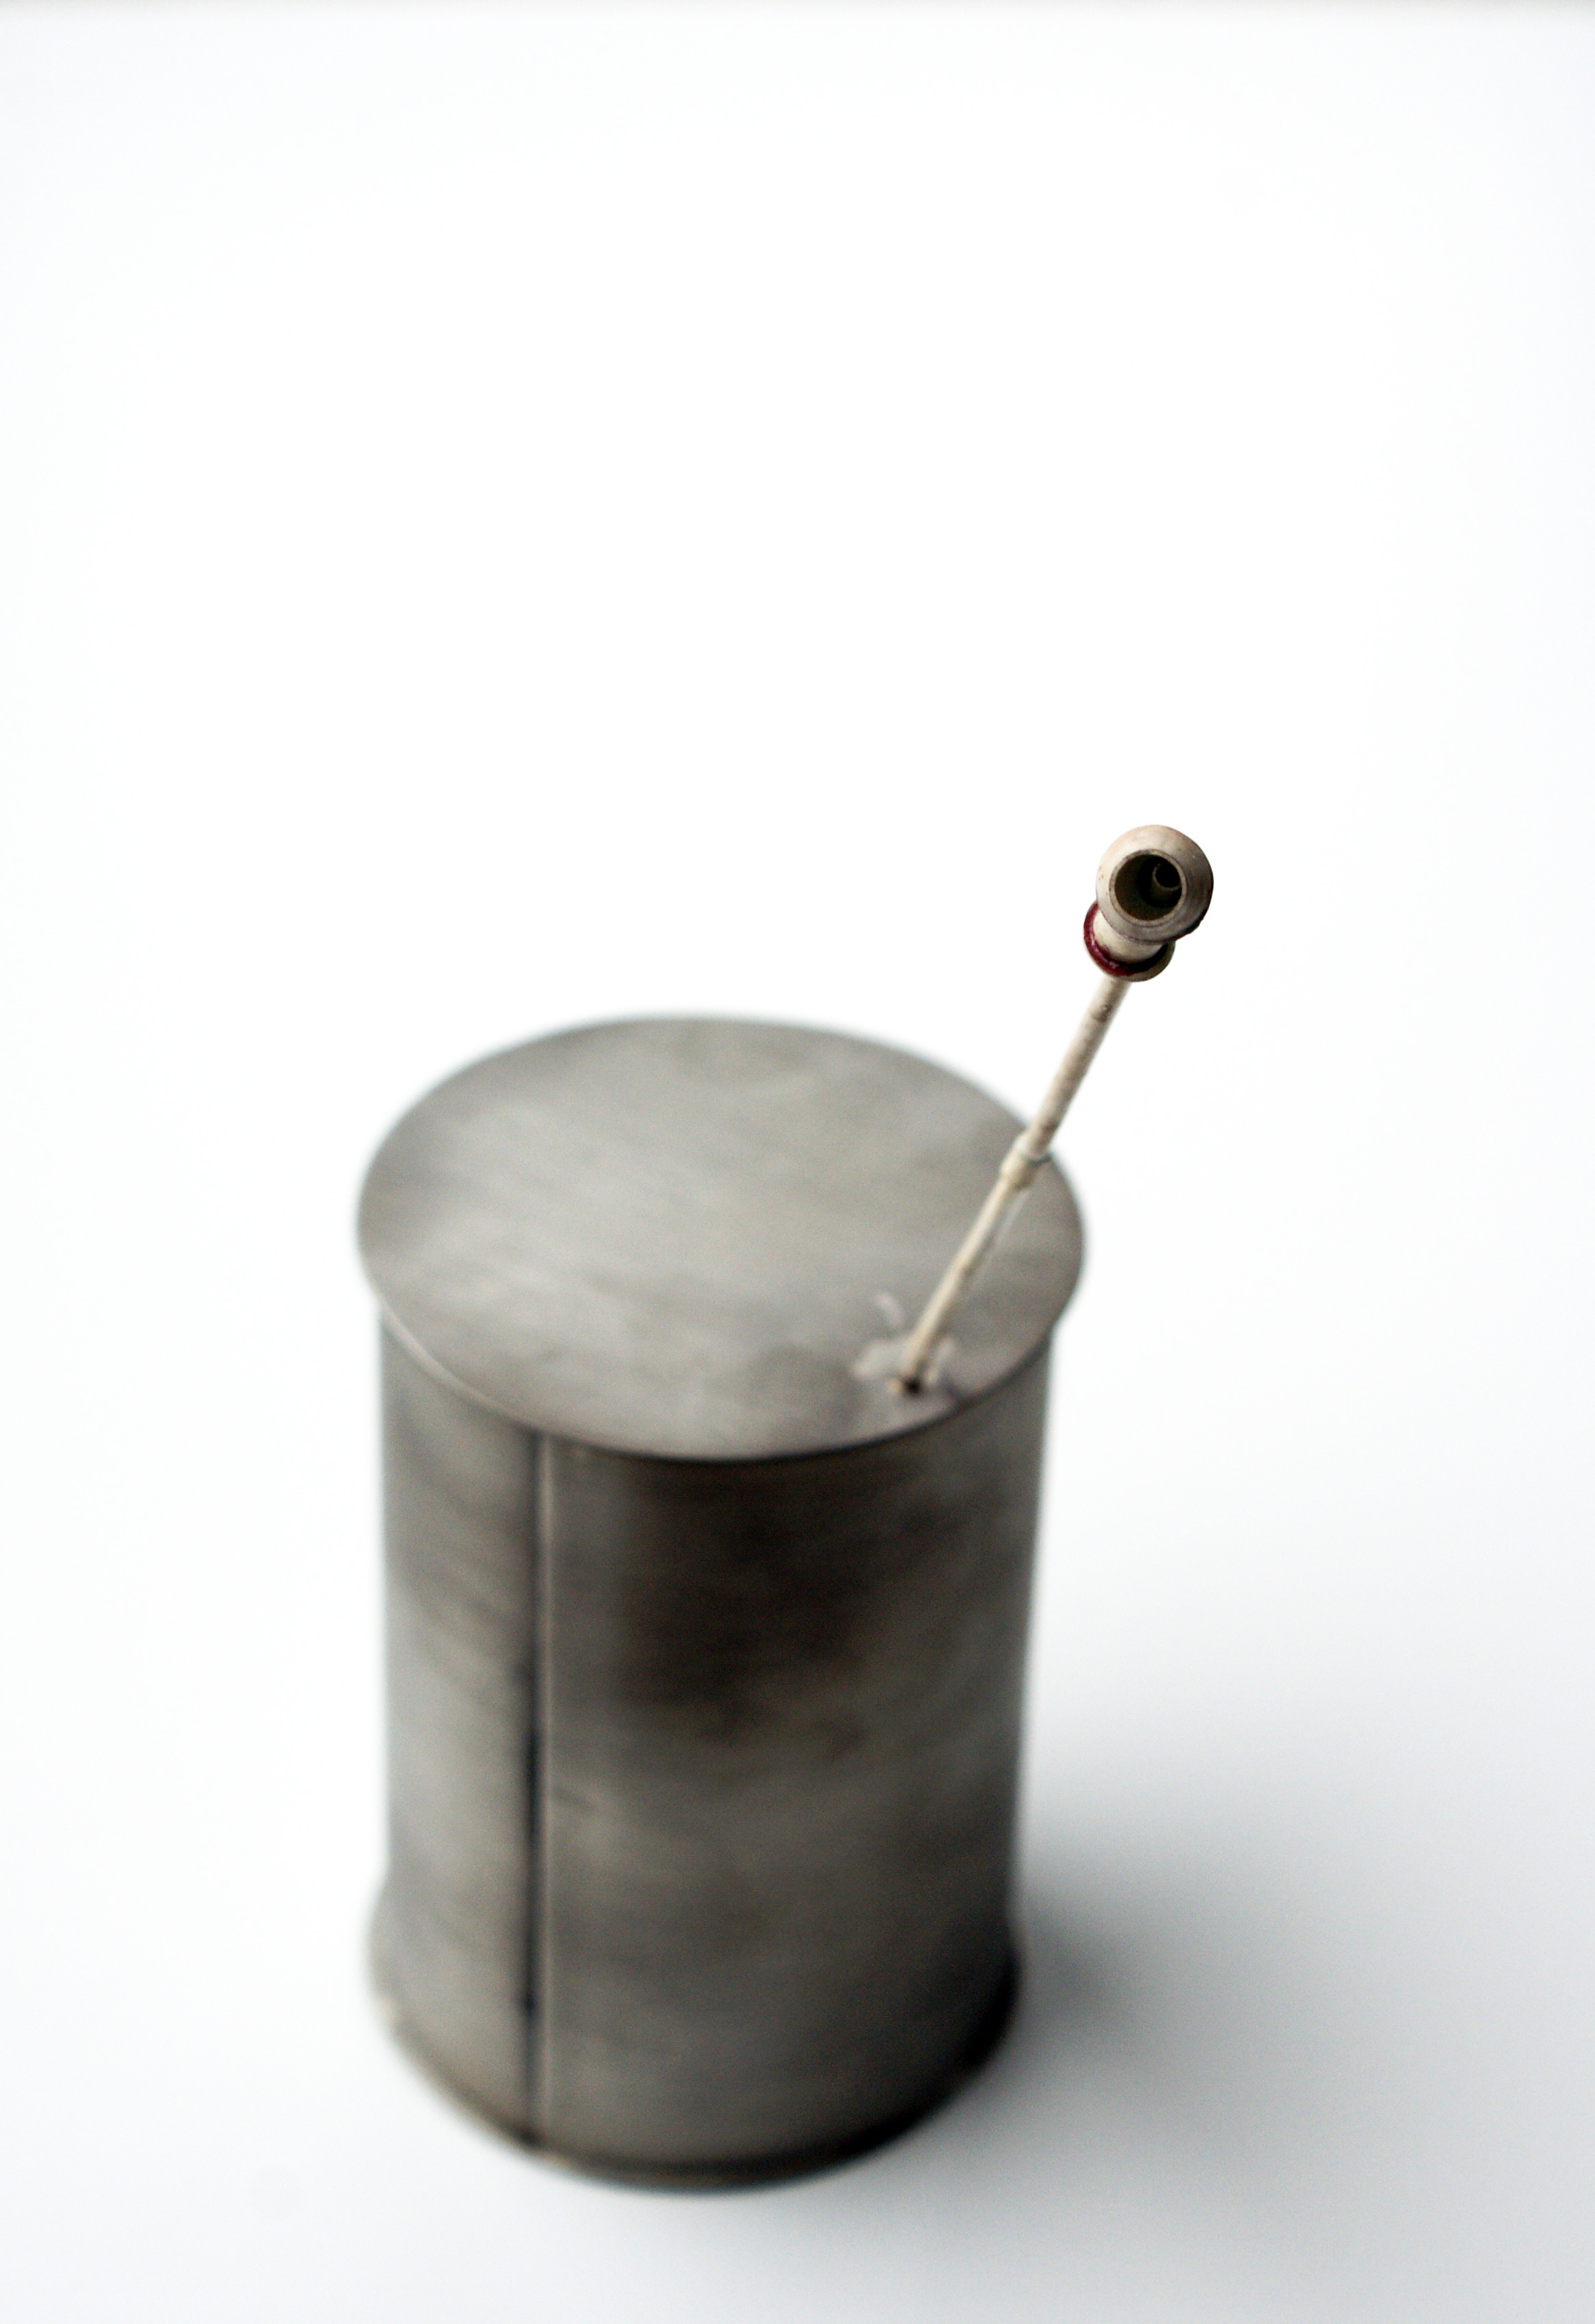 nickel_cylinder_2_detail.jpg